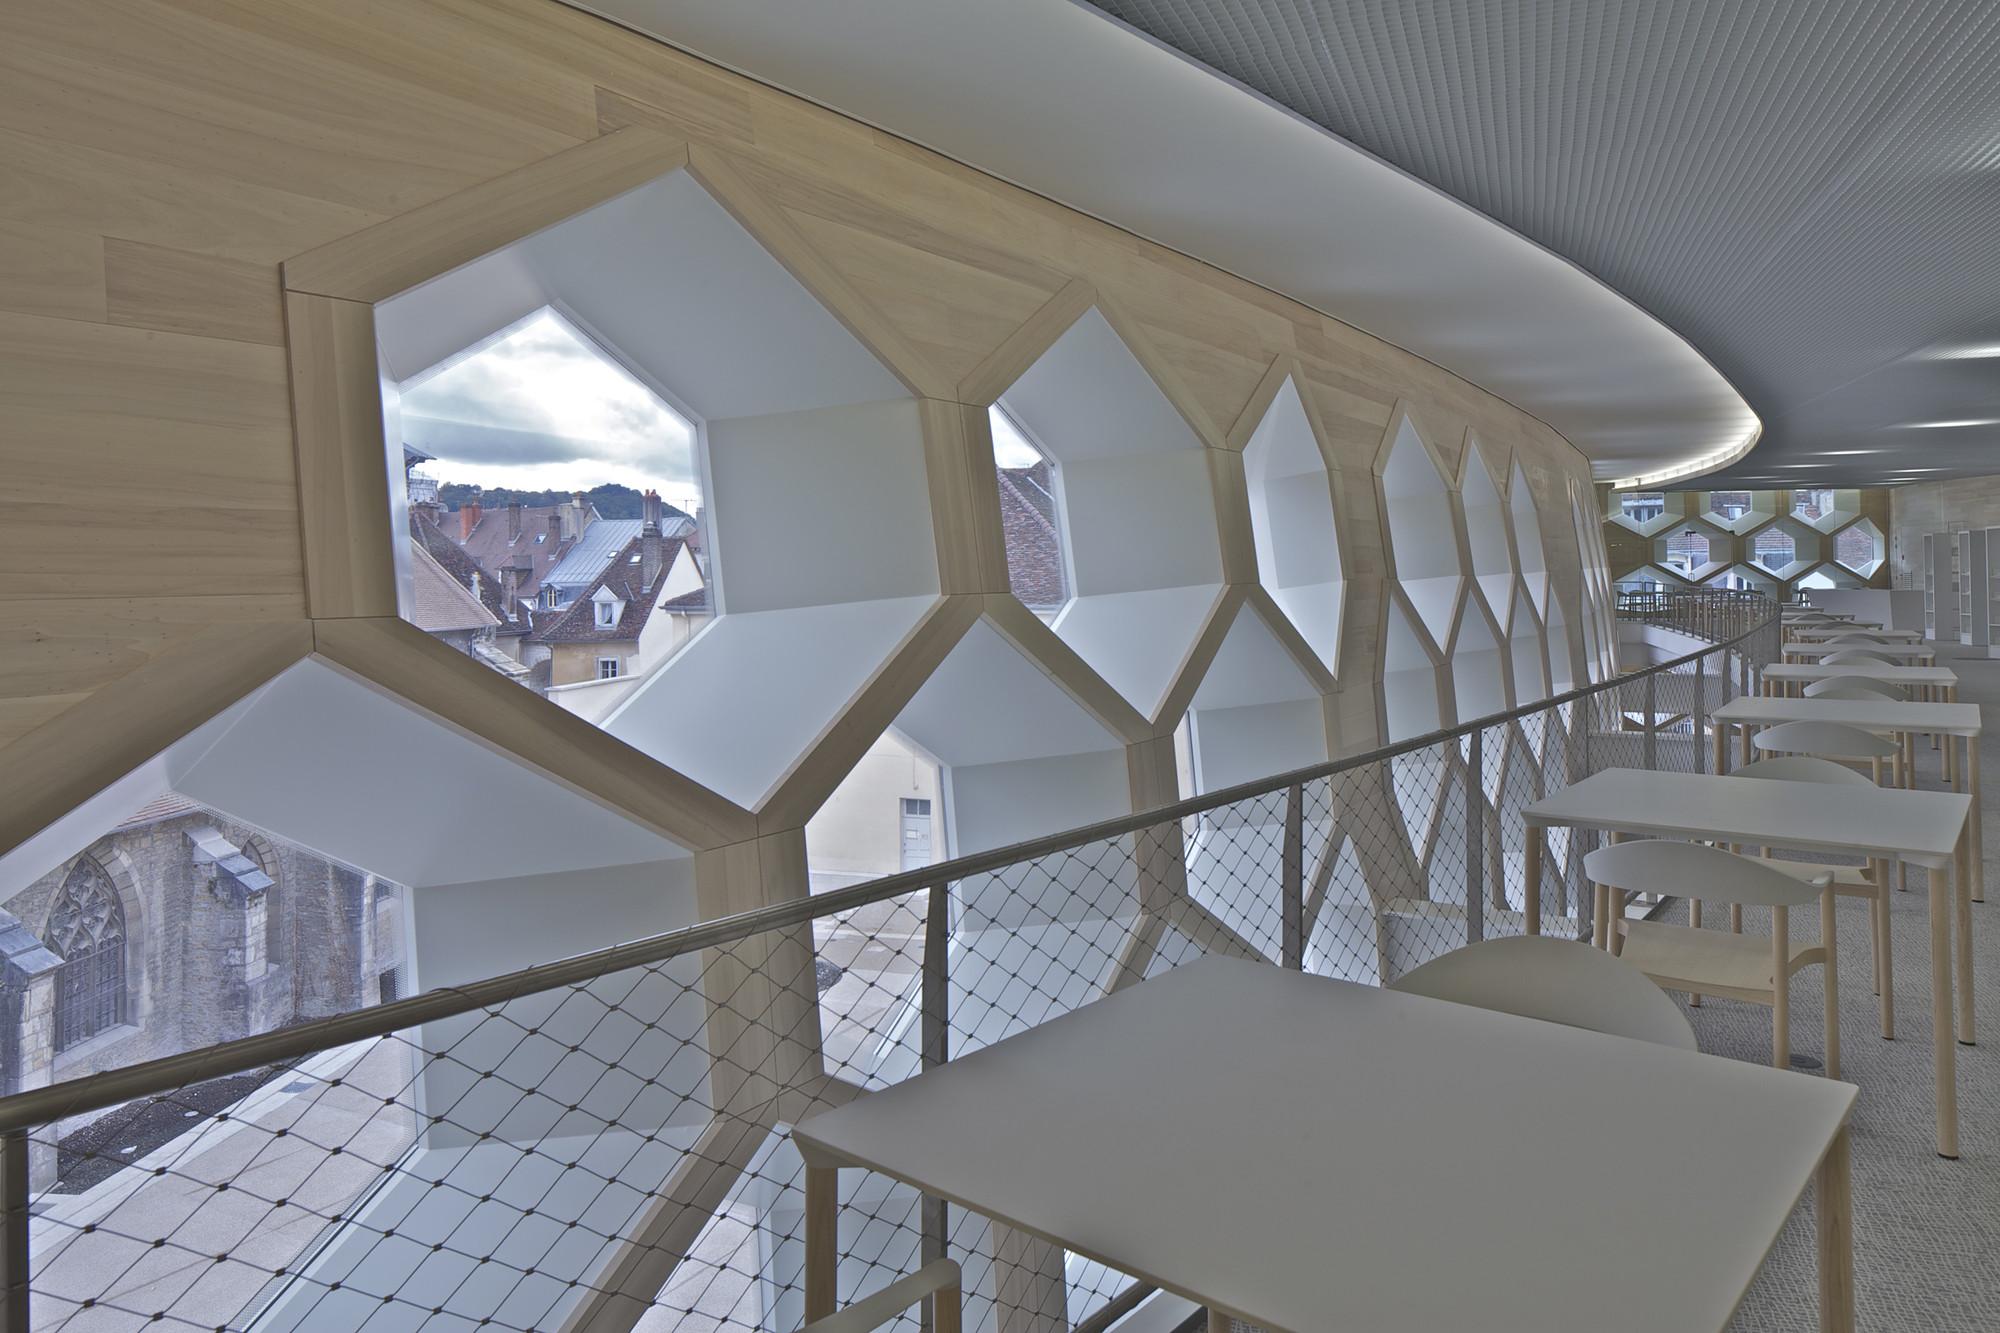 gallery of lons le saunier mediatheque du besset lyon architectes 15. Black Bedroom Furniture Sets. Home Design Ideas